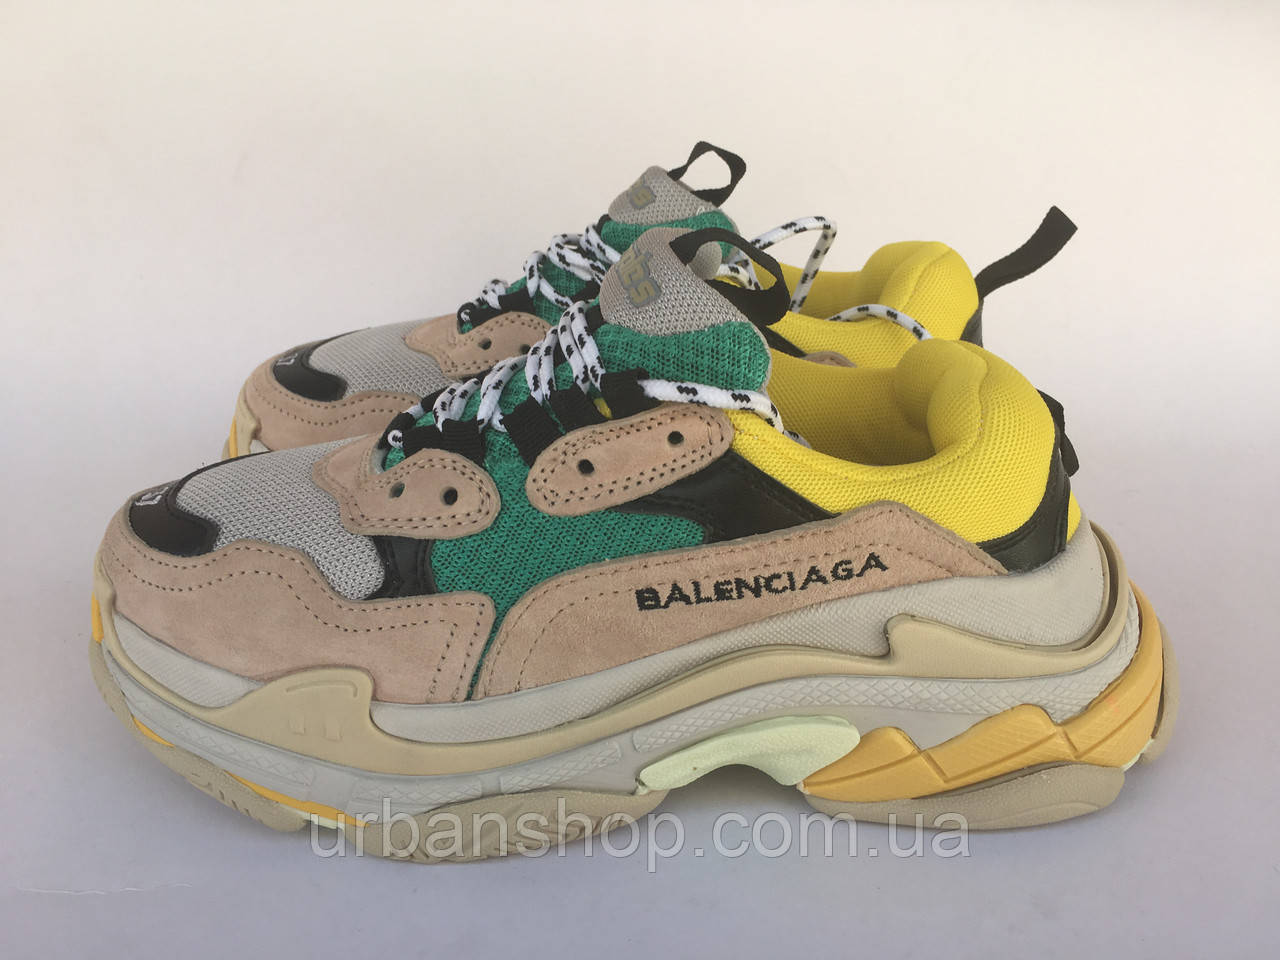 Balenciaga Speed Trainer Triple Black Real Vs Fake Mount